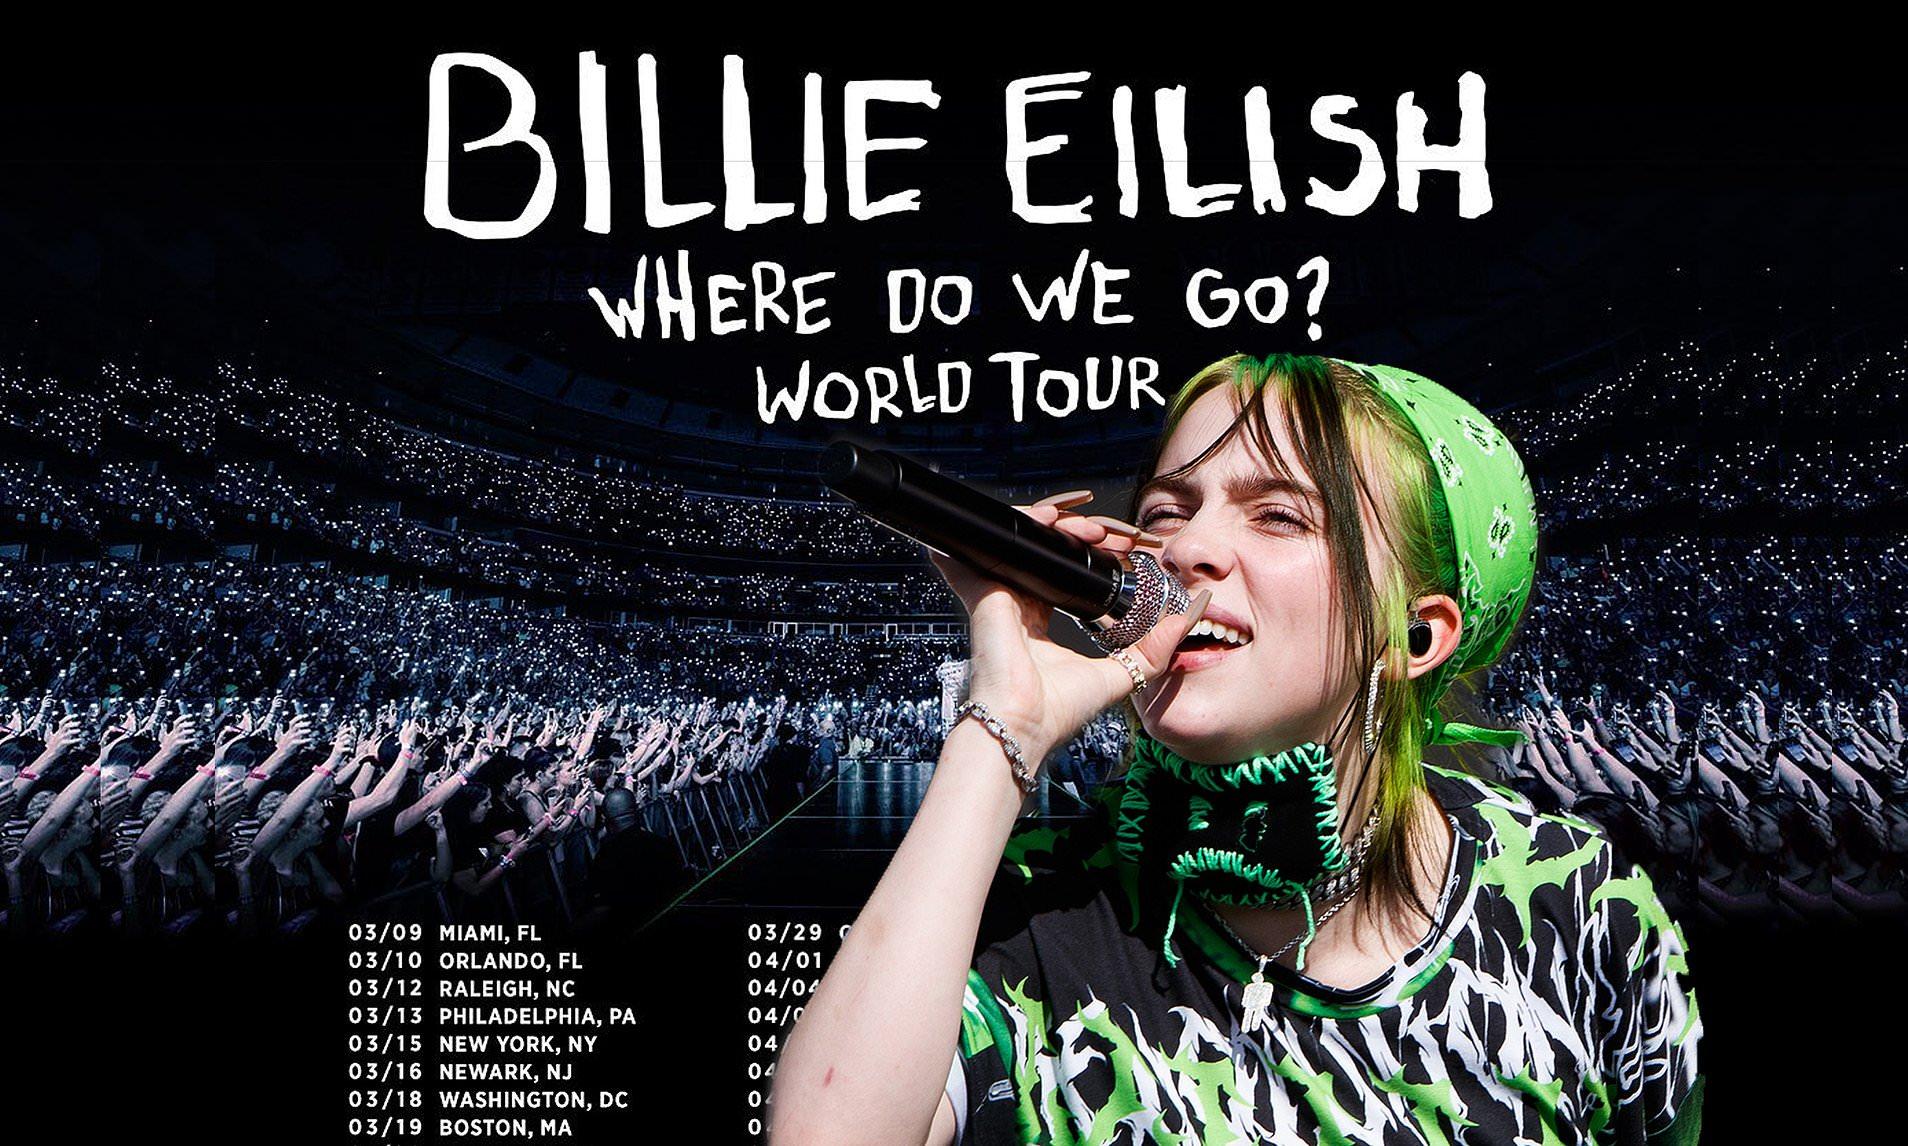 Billie Eilish Tackles Body Shaming As World Tour Kicks Off